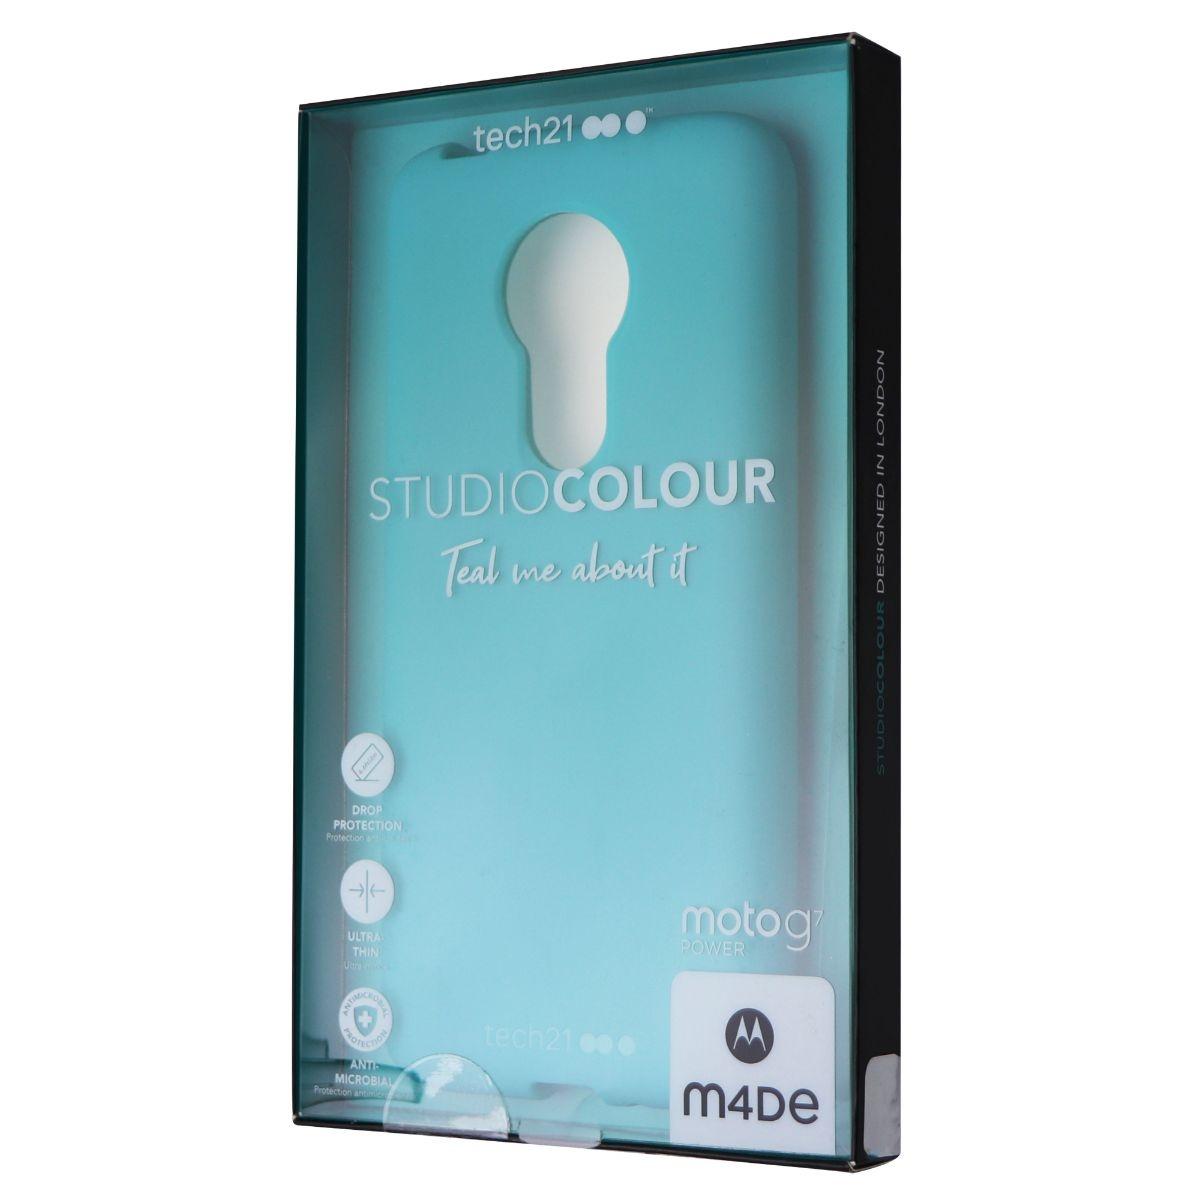 Tech21 Studio Colour Series Gel Case for Motorola Moto G7 Power - Teal